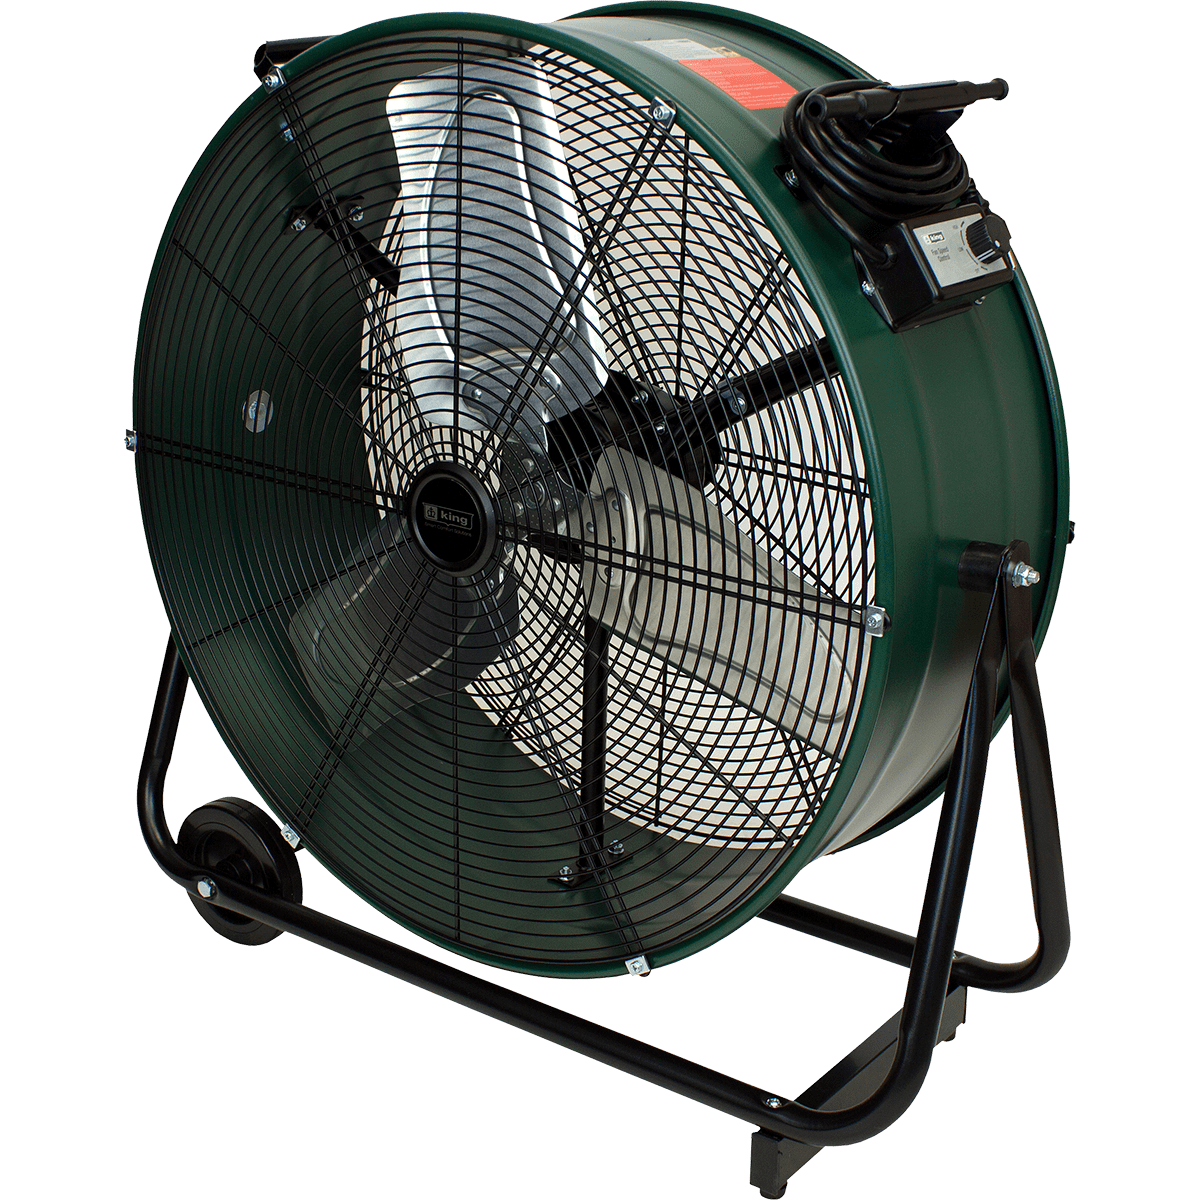 King Electric 24-in. Direct Drive Tiltable Drum Fan Model: DFC-24D-S